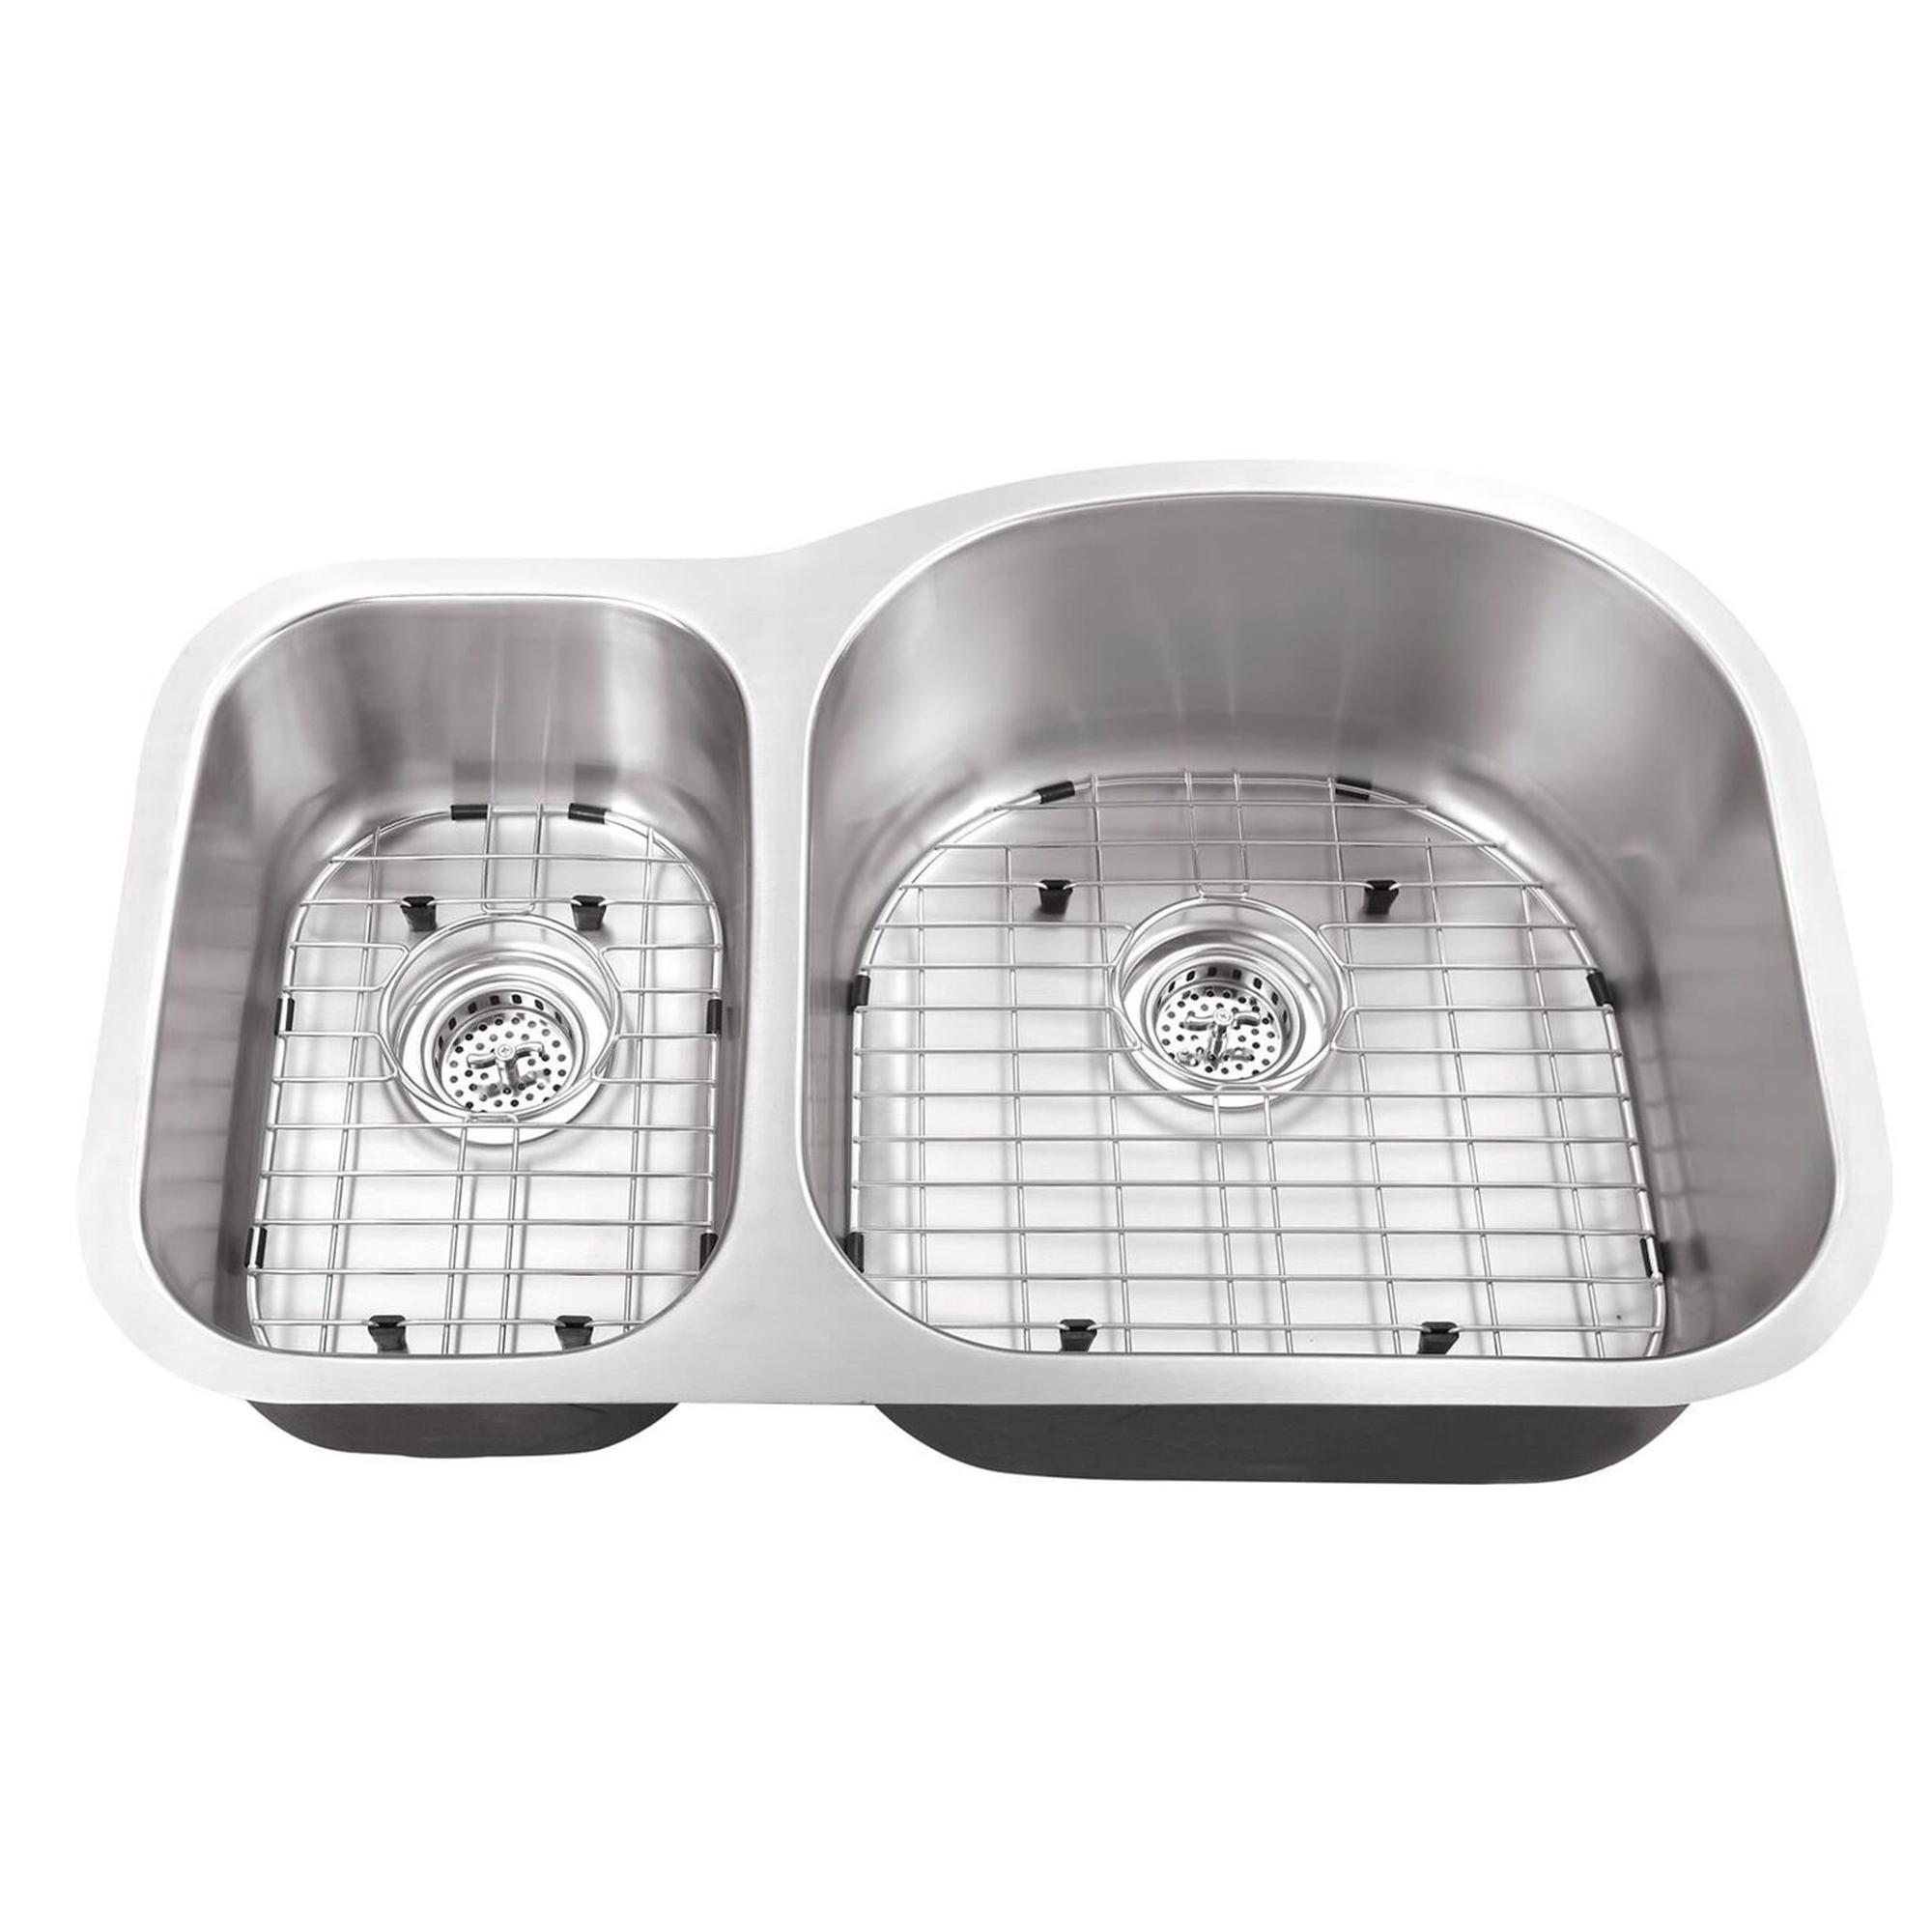 31 1 2 in 30 70 bowl eurostyle 16 ga stainless steel kitchen sink cahaba designs